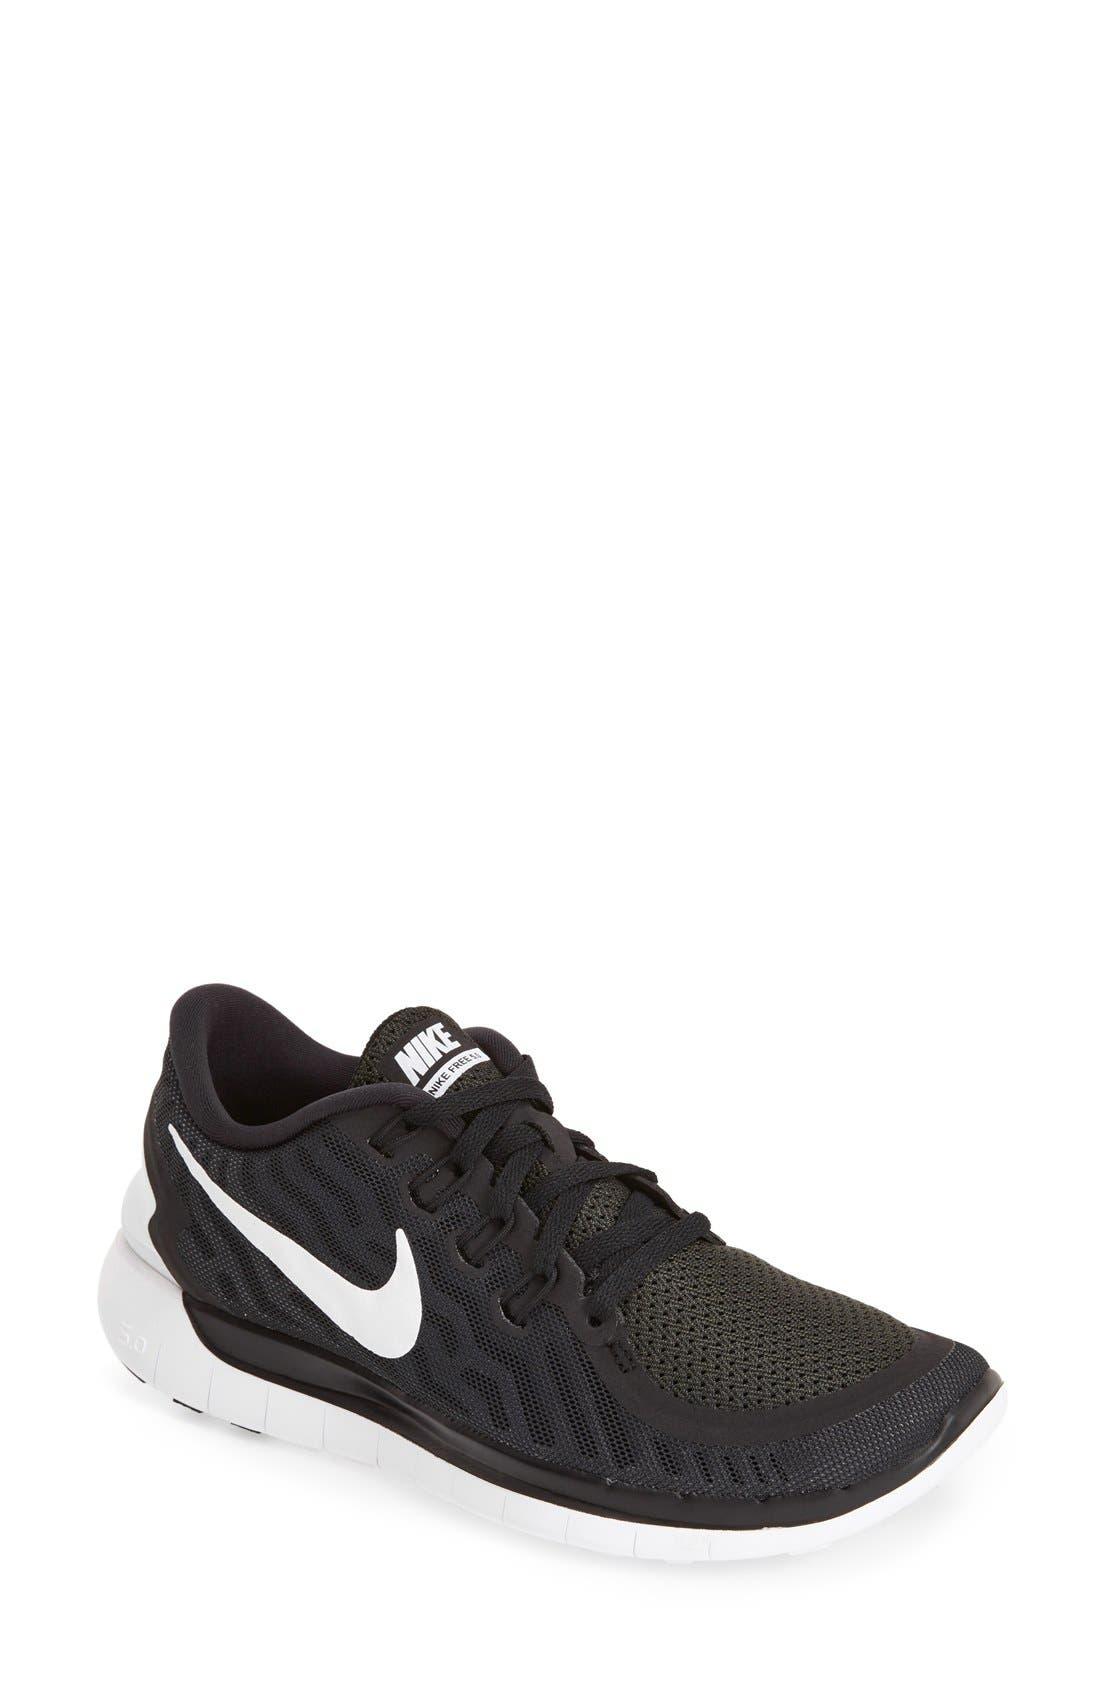 NIKE 'Free 5.0' Running Shoe, Main, color, 002